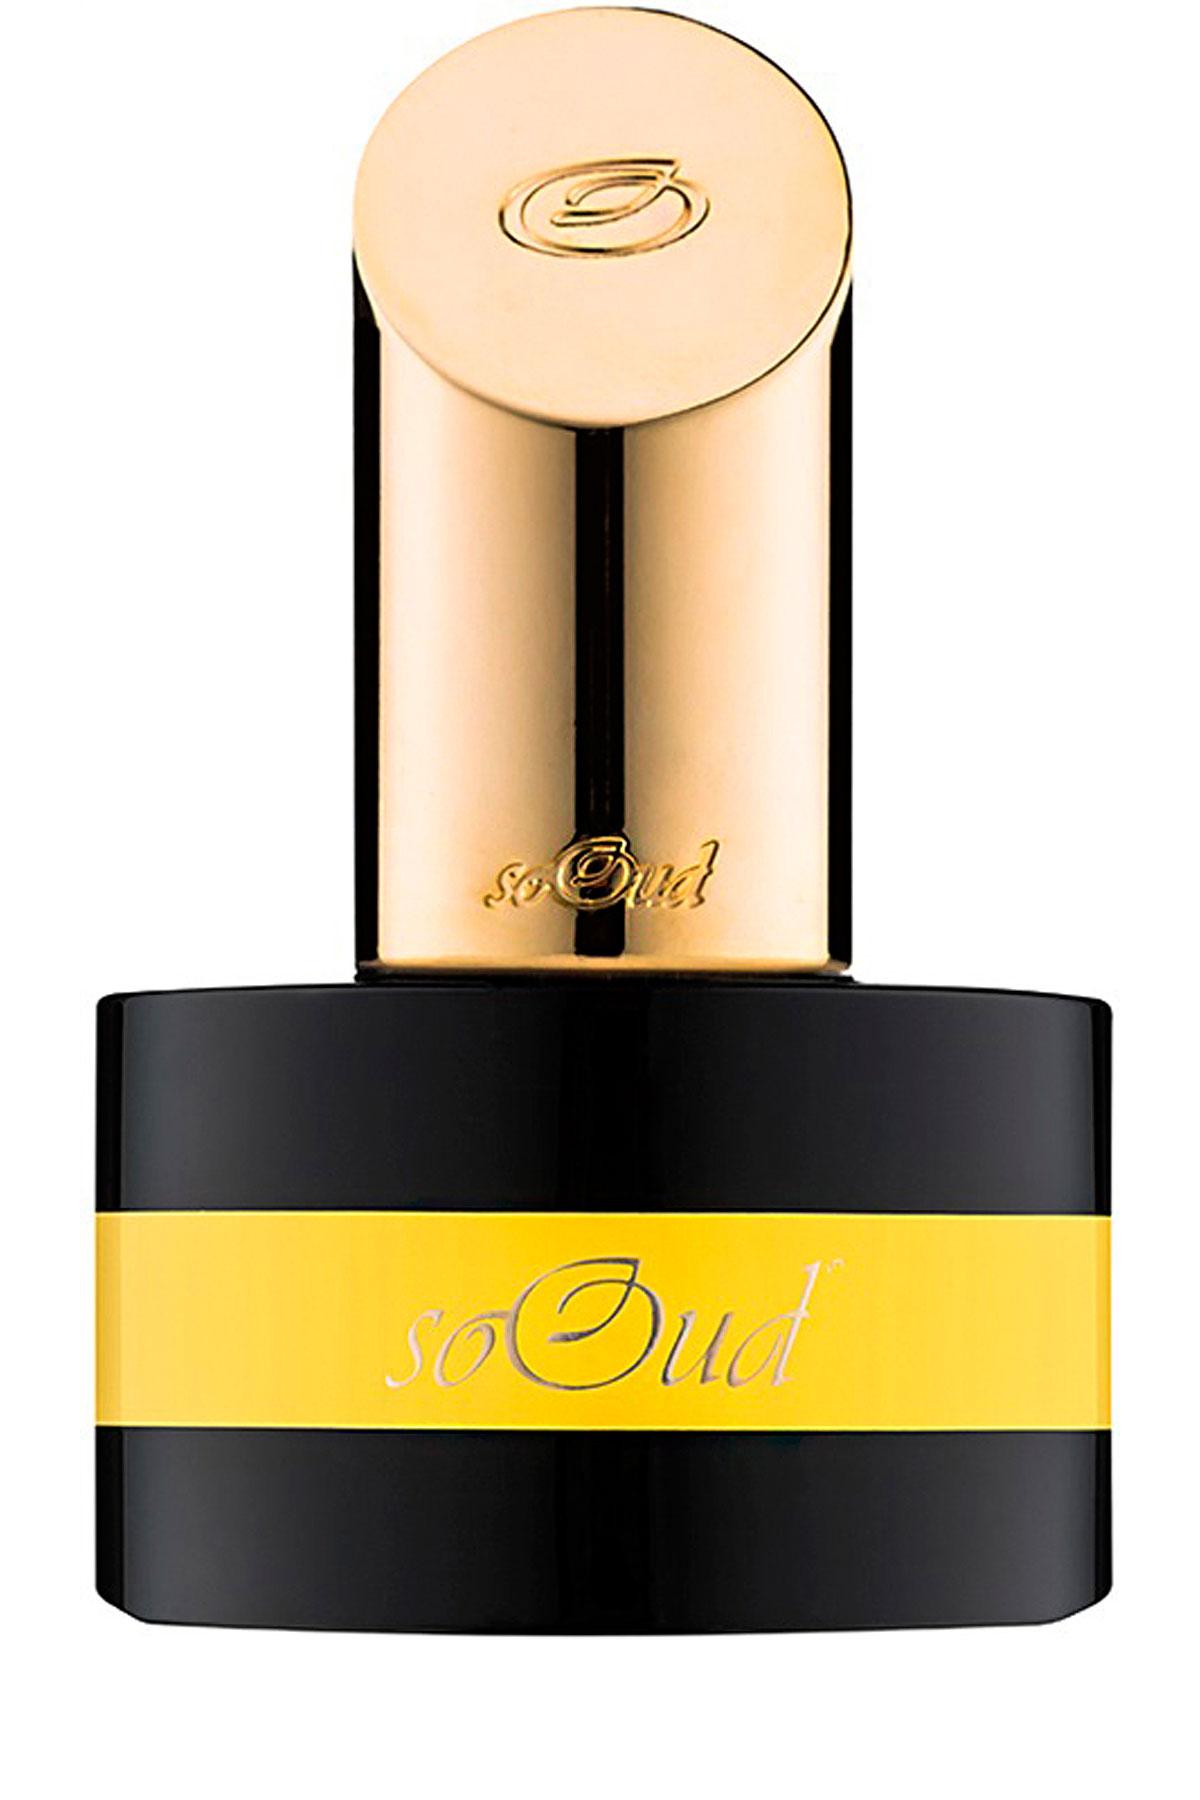 SoOud Fragrances for Men, Kanz - Parfume Nektar - 30 Ml, 2019, 30 ml